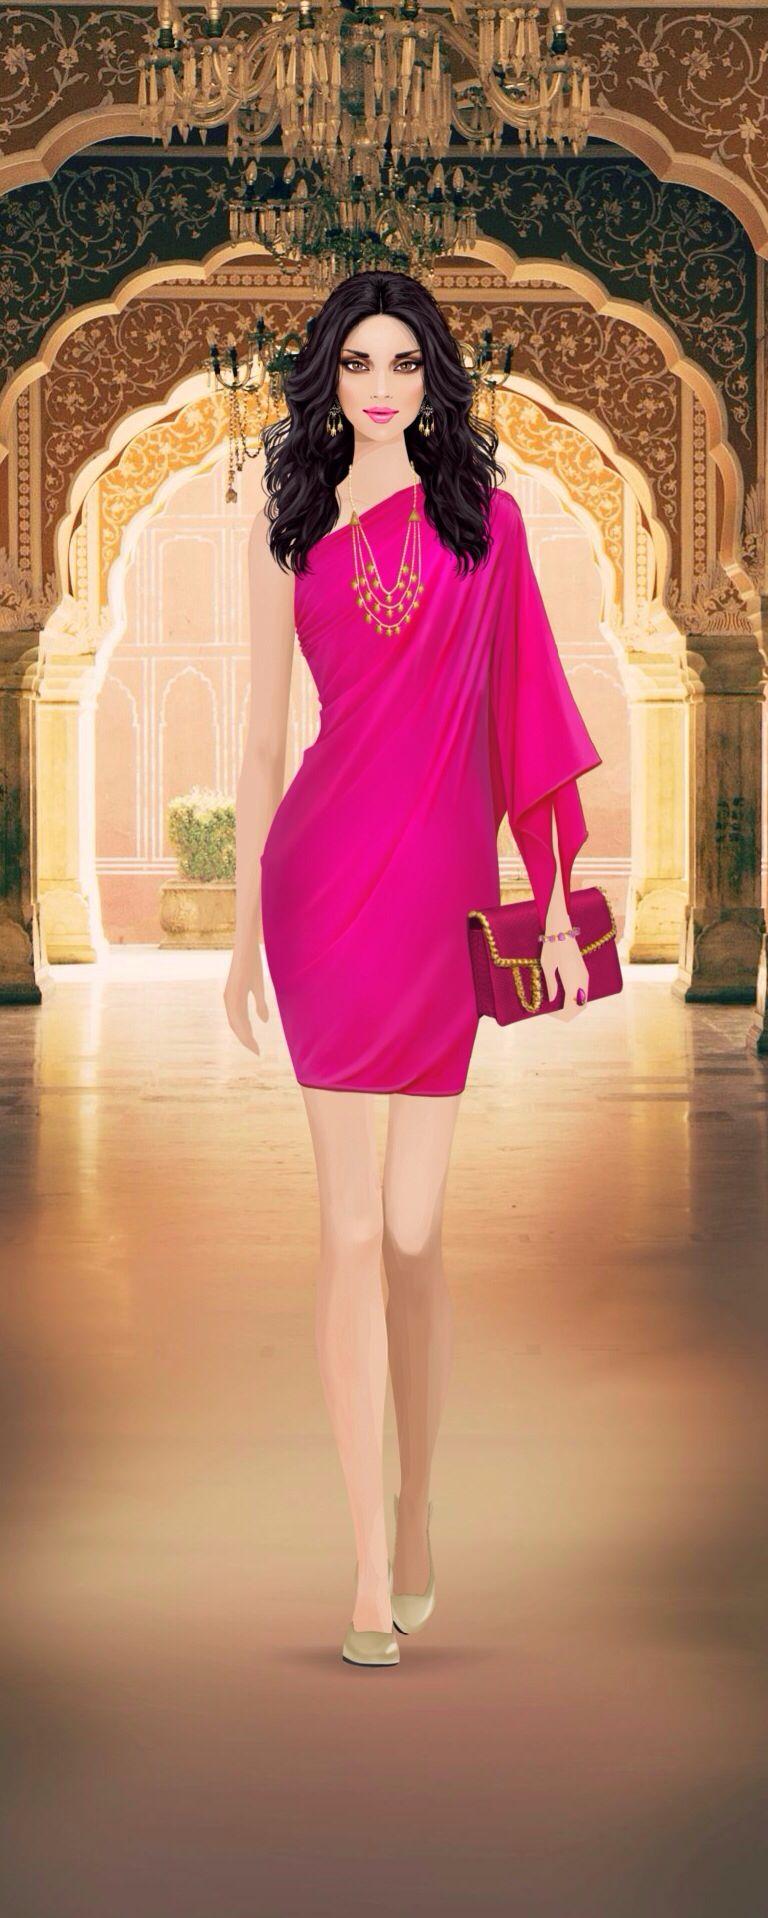 Bollywood Star\'s Wedding 4+ | Artwork | Pinterest | Vestidos de ...